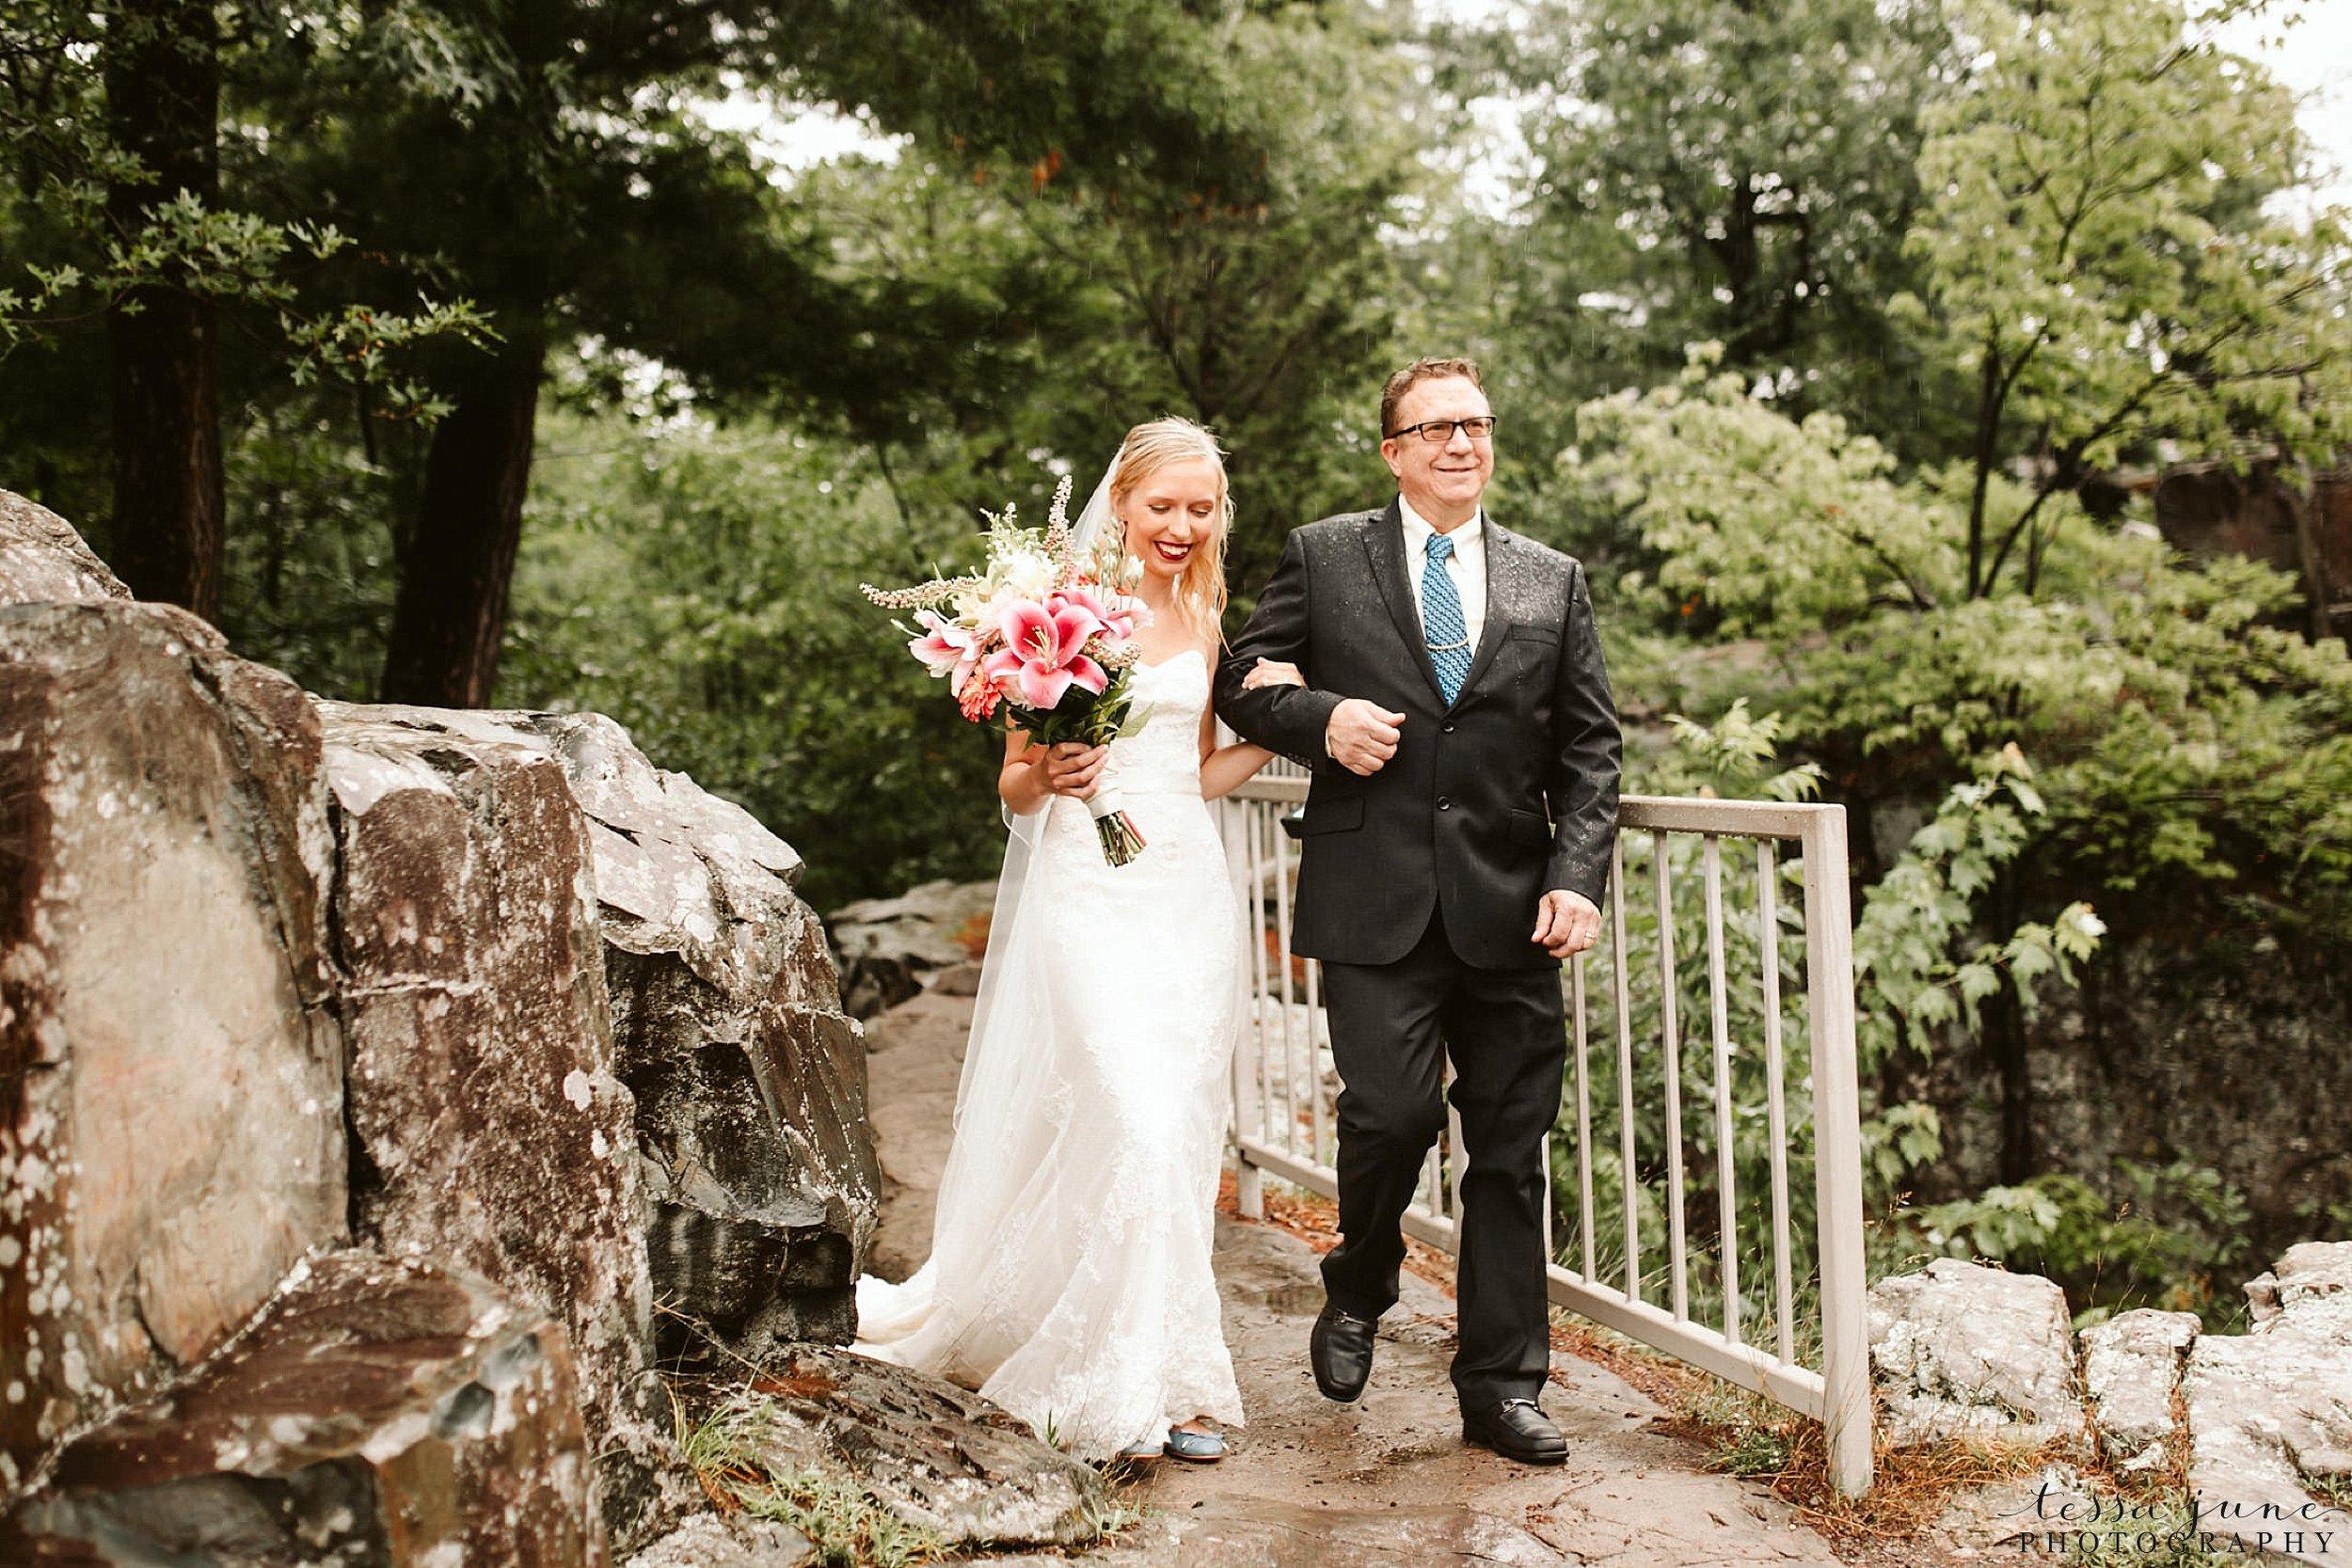 taylors-falls-rainy-elopement-wedding-interstate-state-park-43.jpg